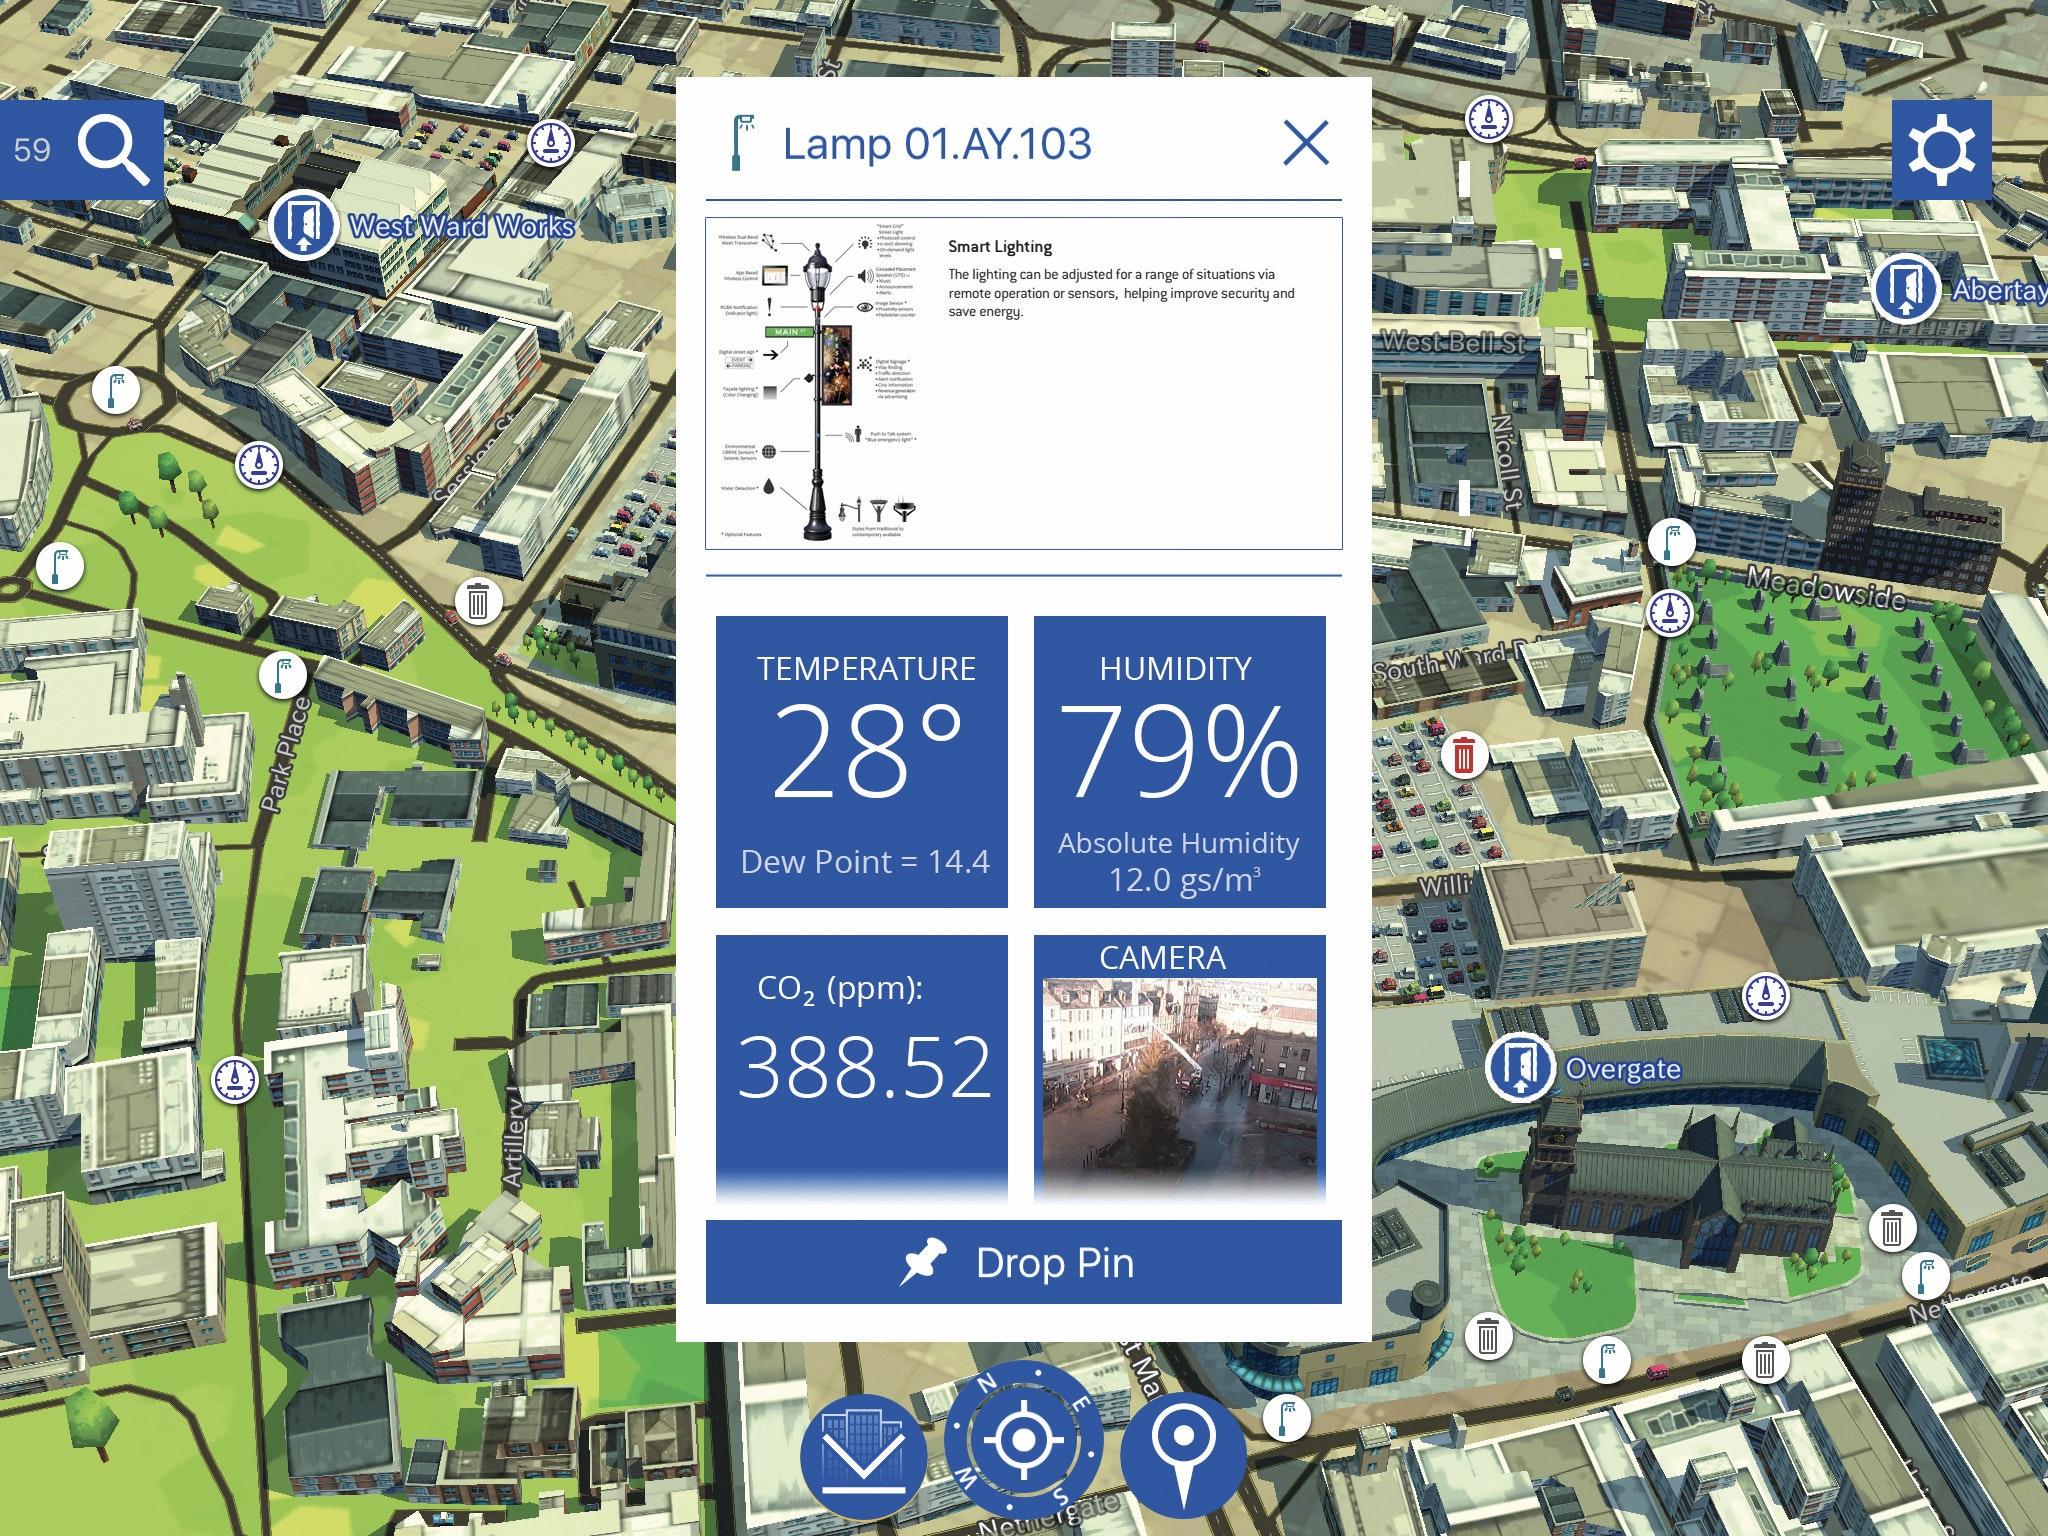 smart city data can also be mapped in wrldjpegrectu003d0020481536u0026autou003dformatcompressu0026wu003d1200 httpswwwinversecomarticle31916 wonder woman post credits